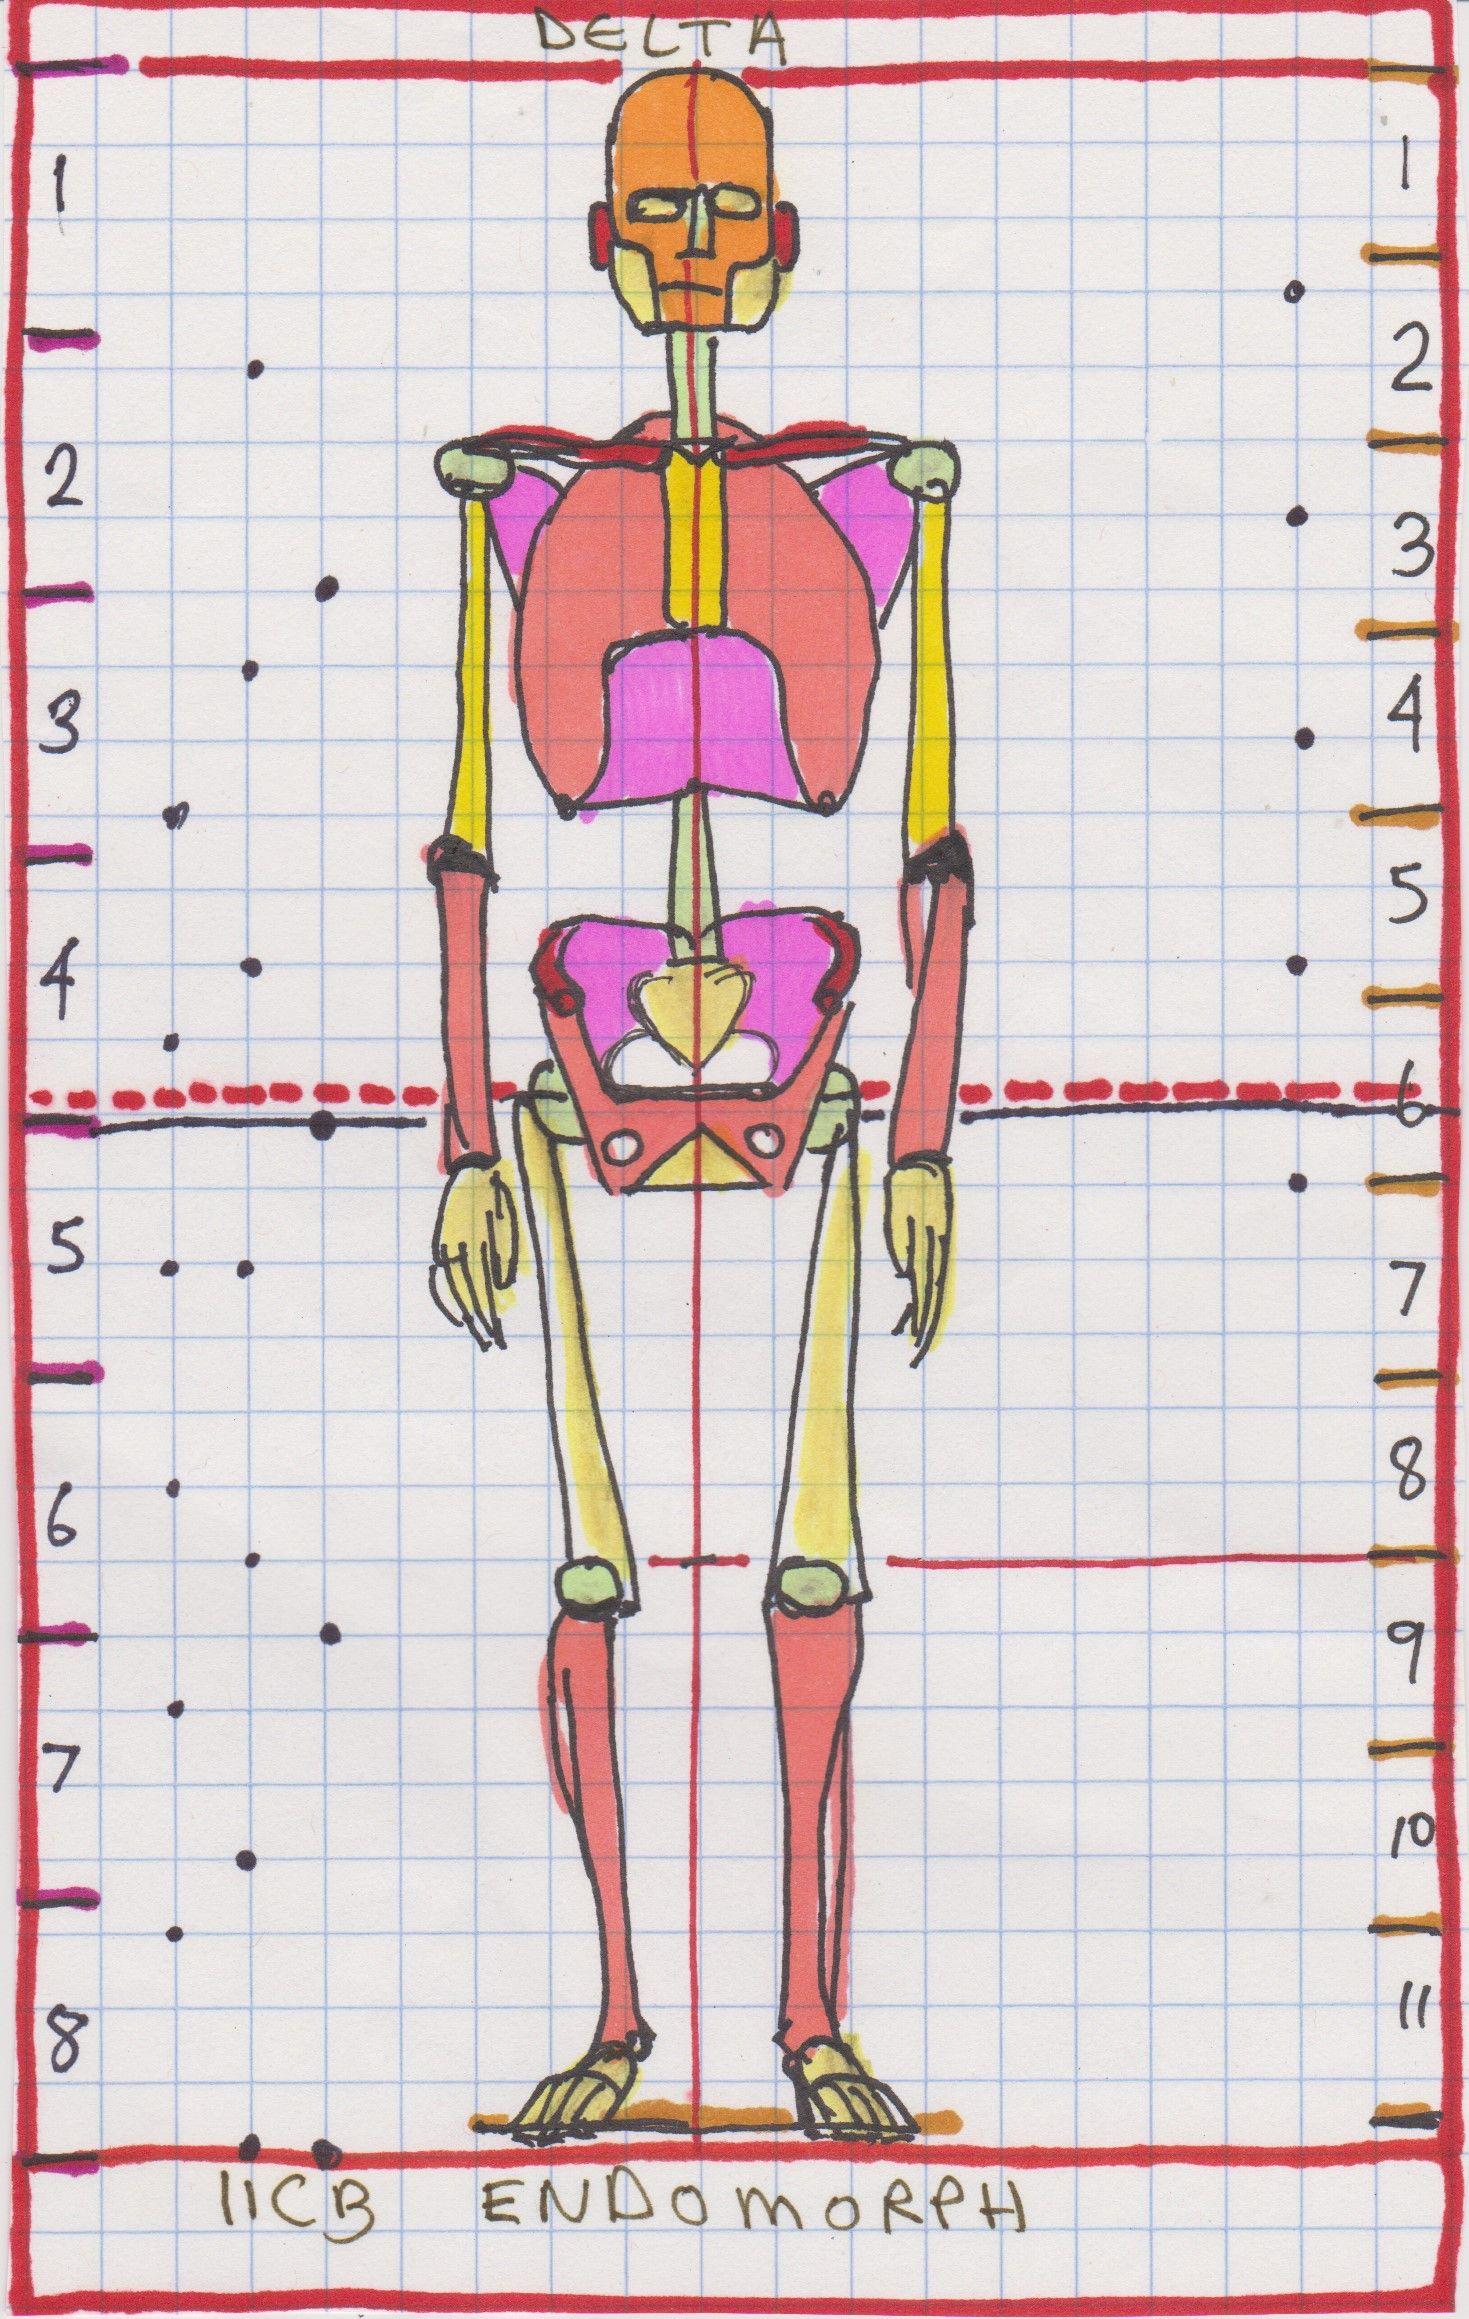 1469x2319 Skedidle Near 8 Head Figure Endomorphic Scale 11 Unit Cranial Box